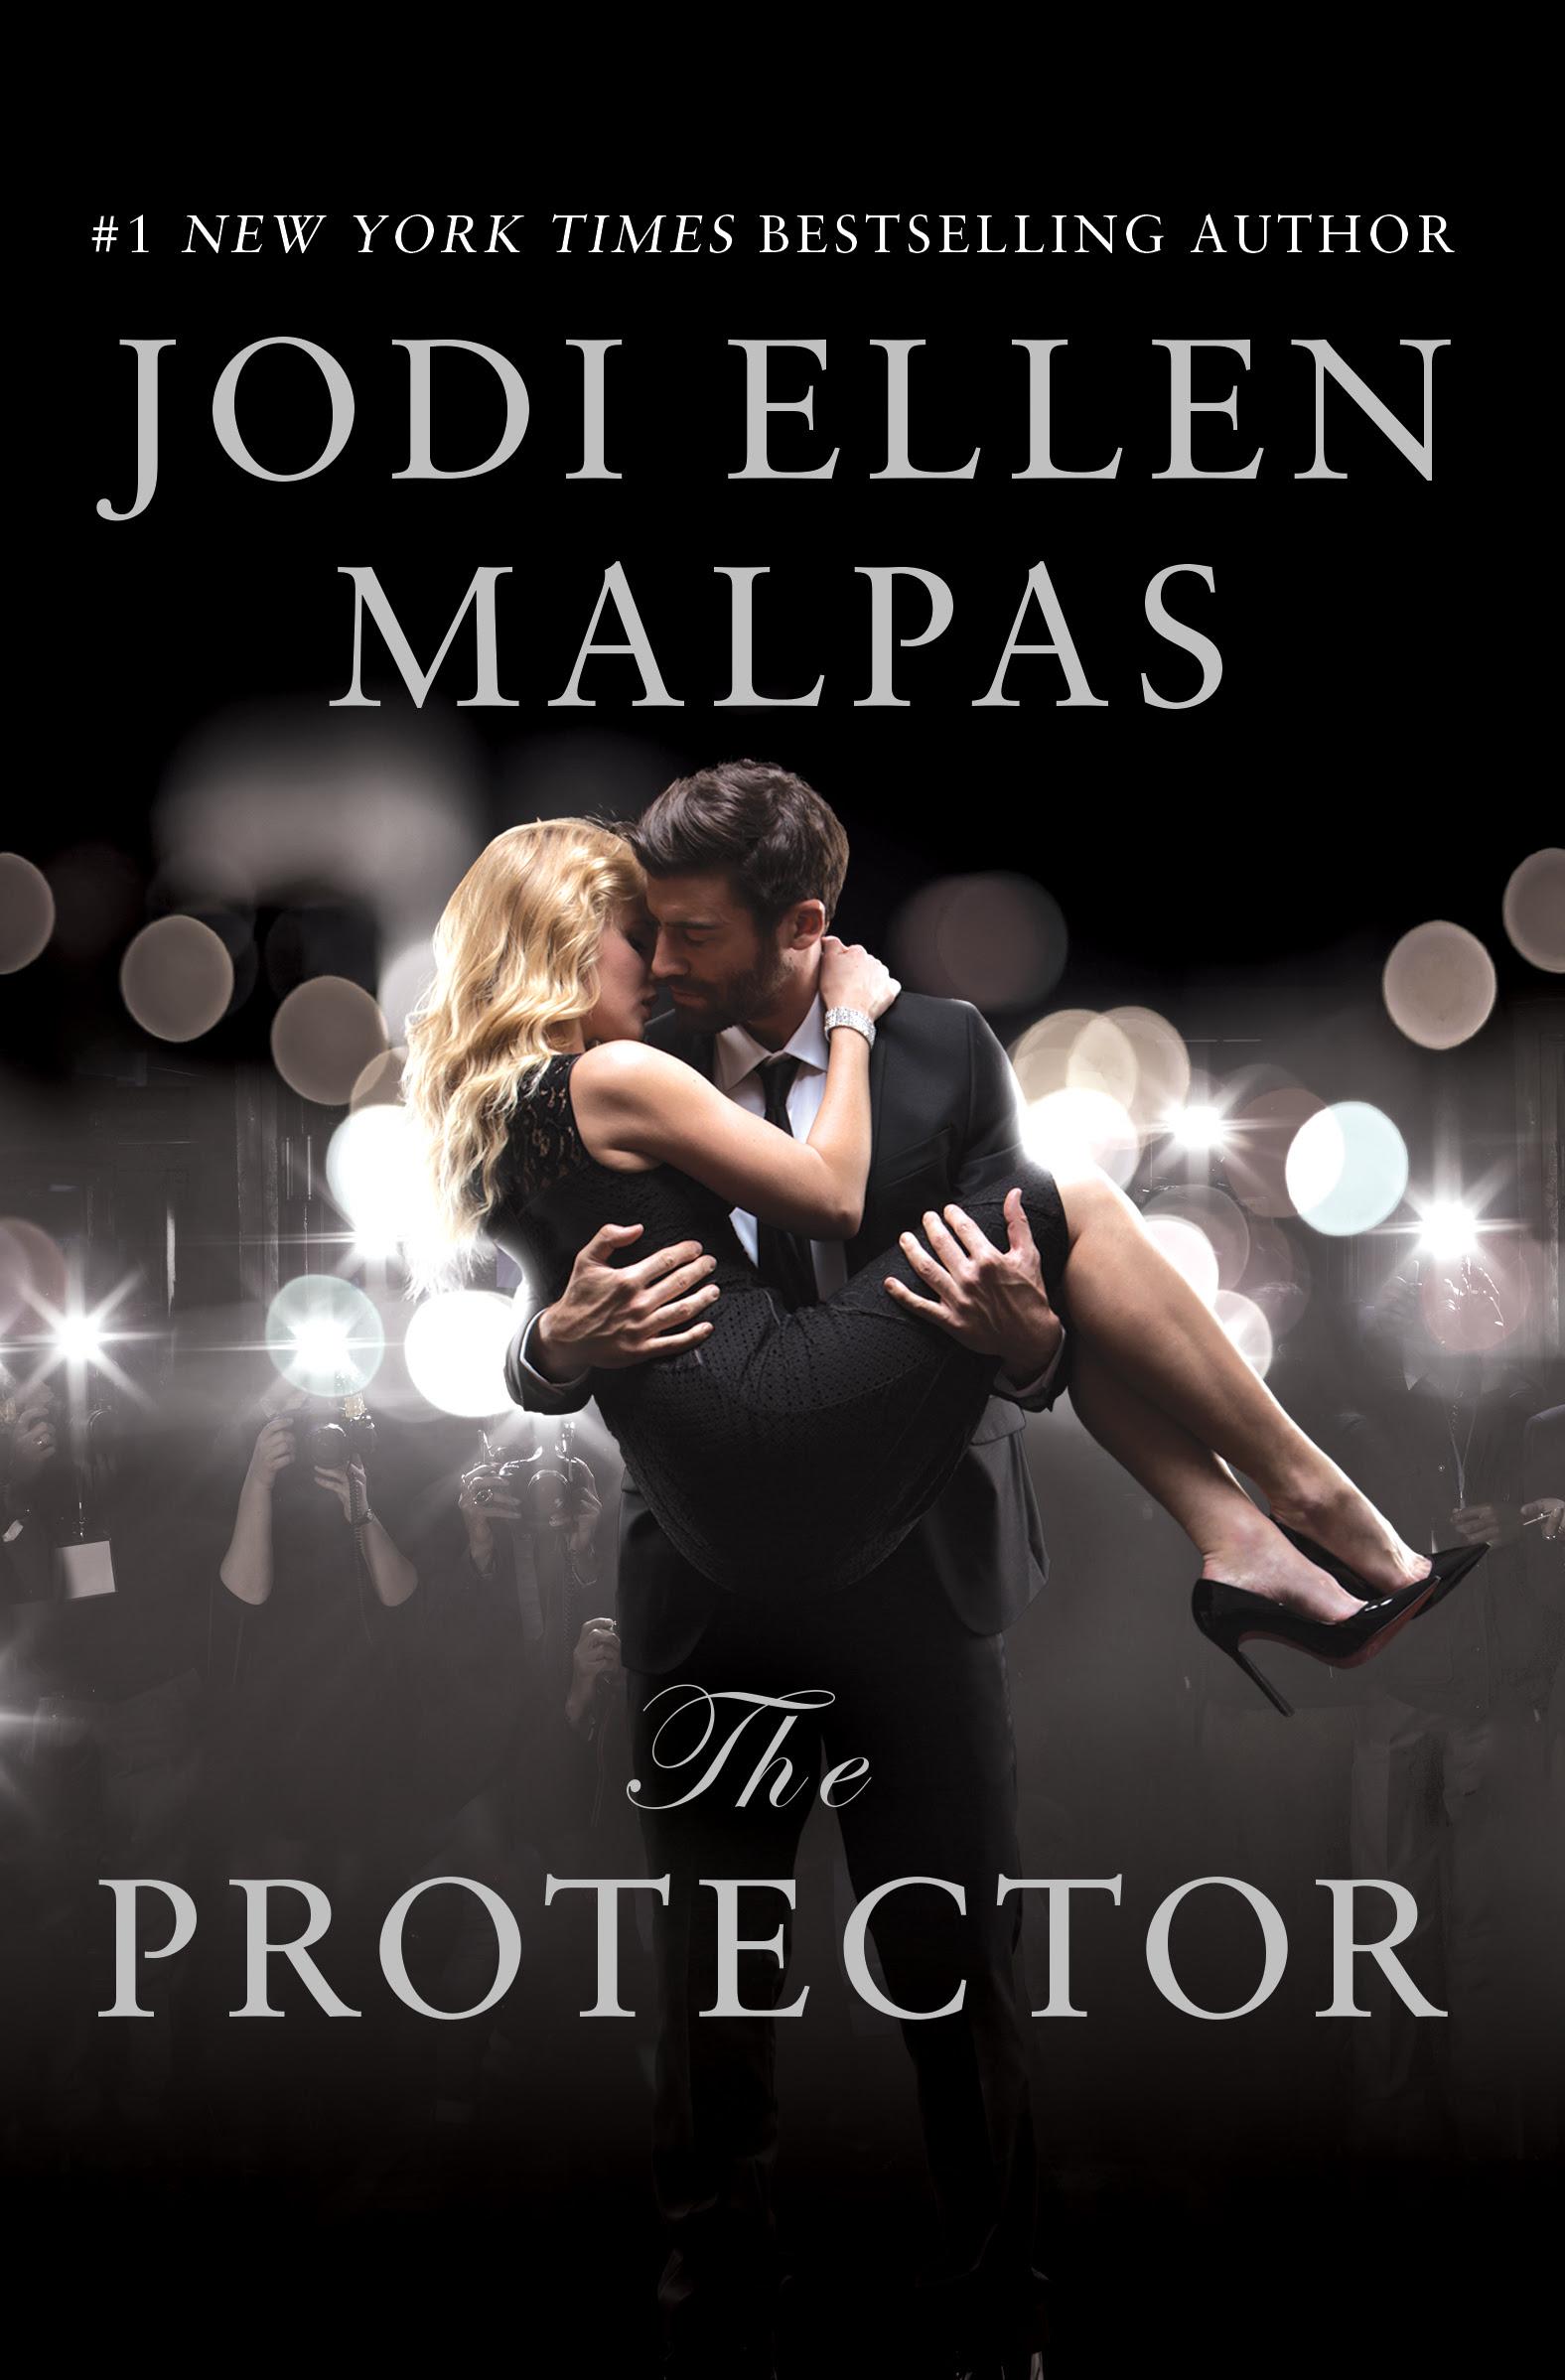 Book Review With Giveaway The Protector By Jodi Ellen Malpas Jodiellenmalpas The Book Avenue